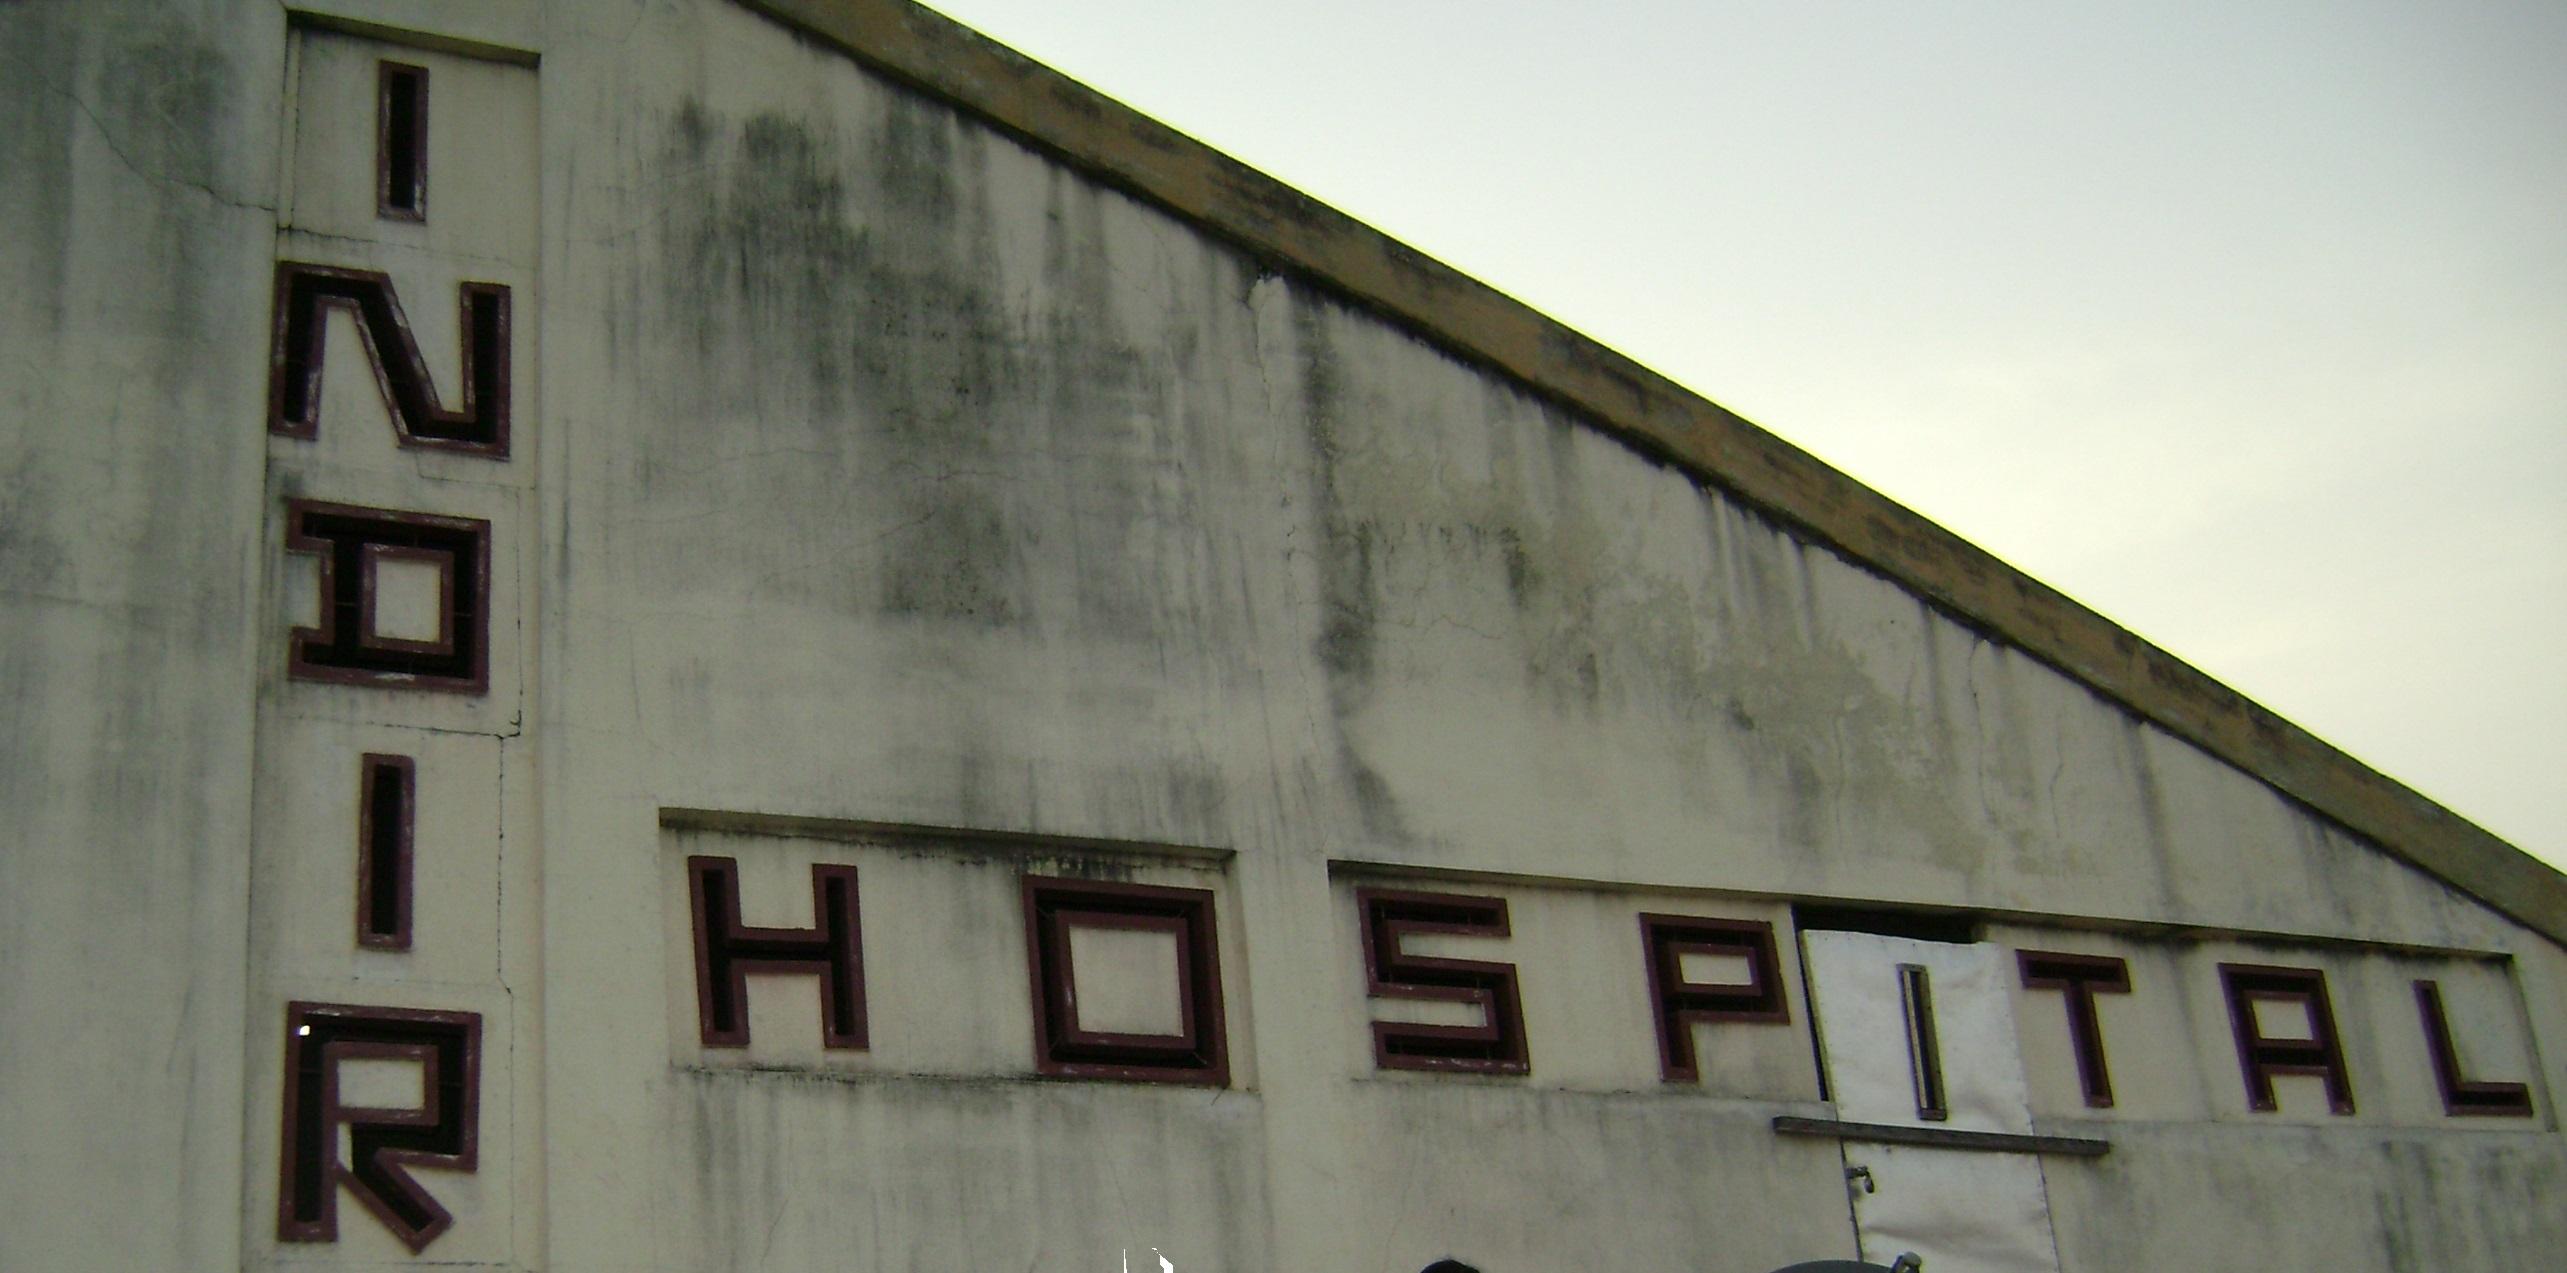 30 Year Old Reputed Hospital for Sale / Lease in Venkatagiri, Andhra Pradesh